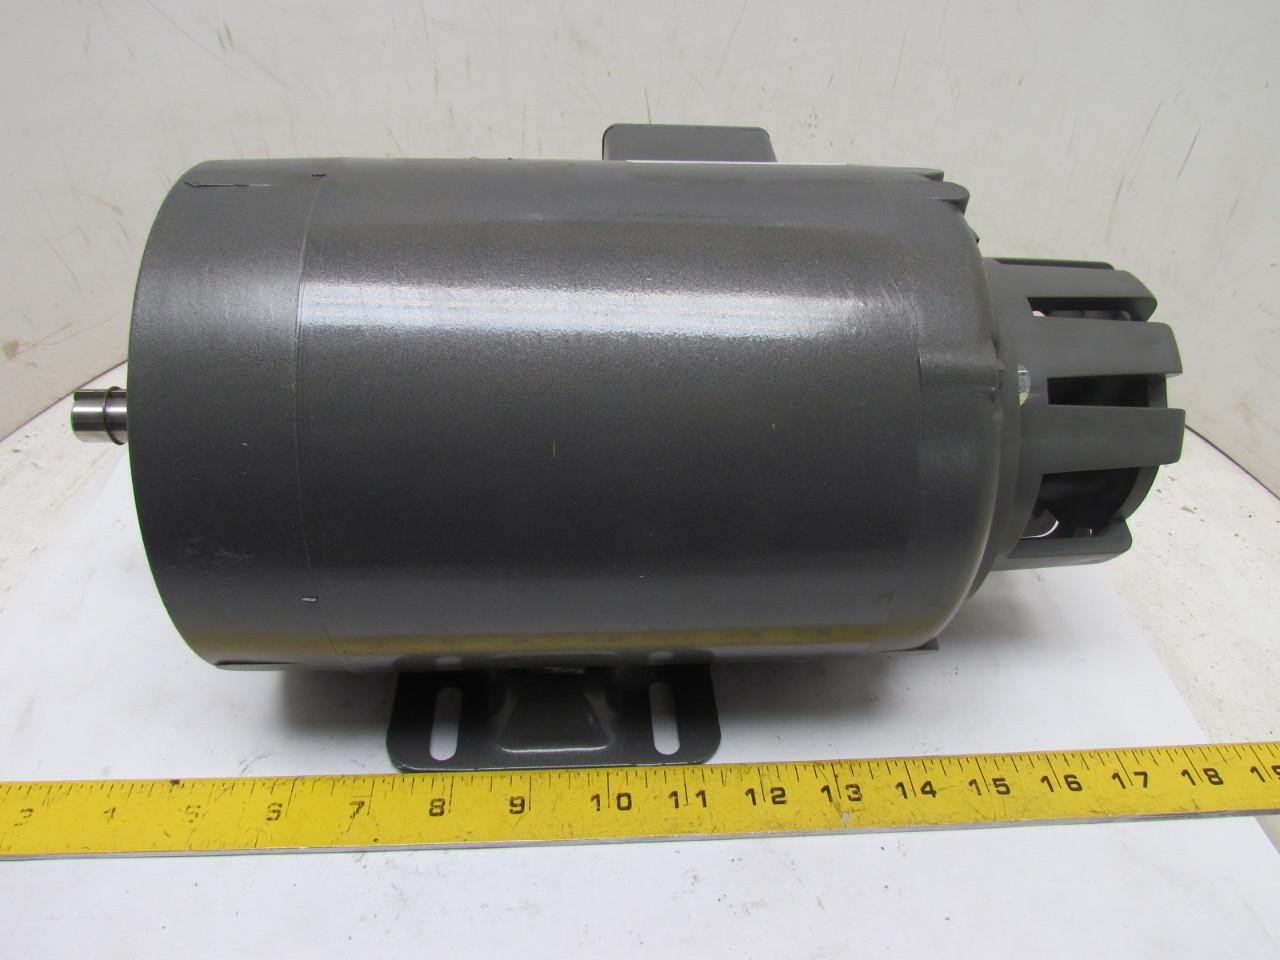 Baldor Idnm3538 Inverter Drive Motor 1 2hp 3 Phase 230